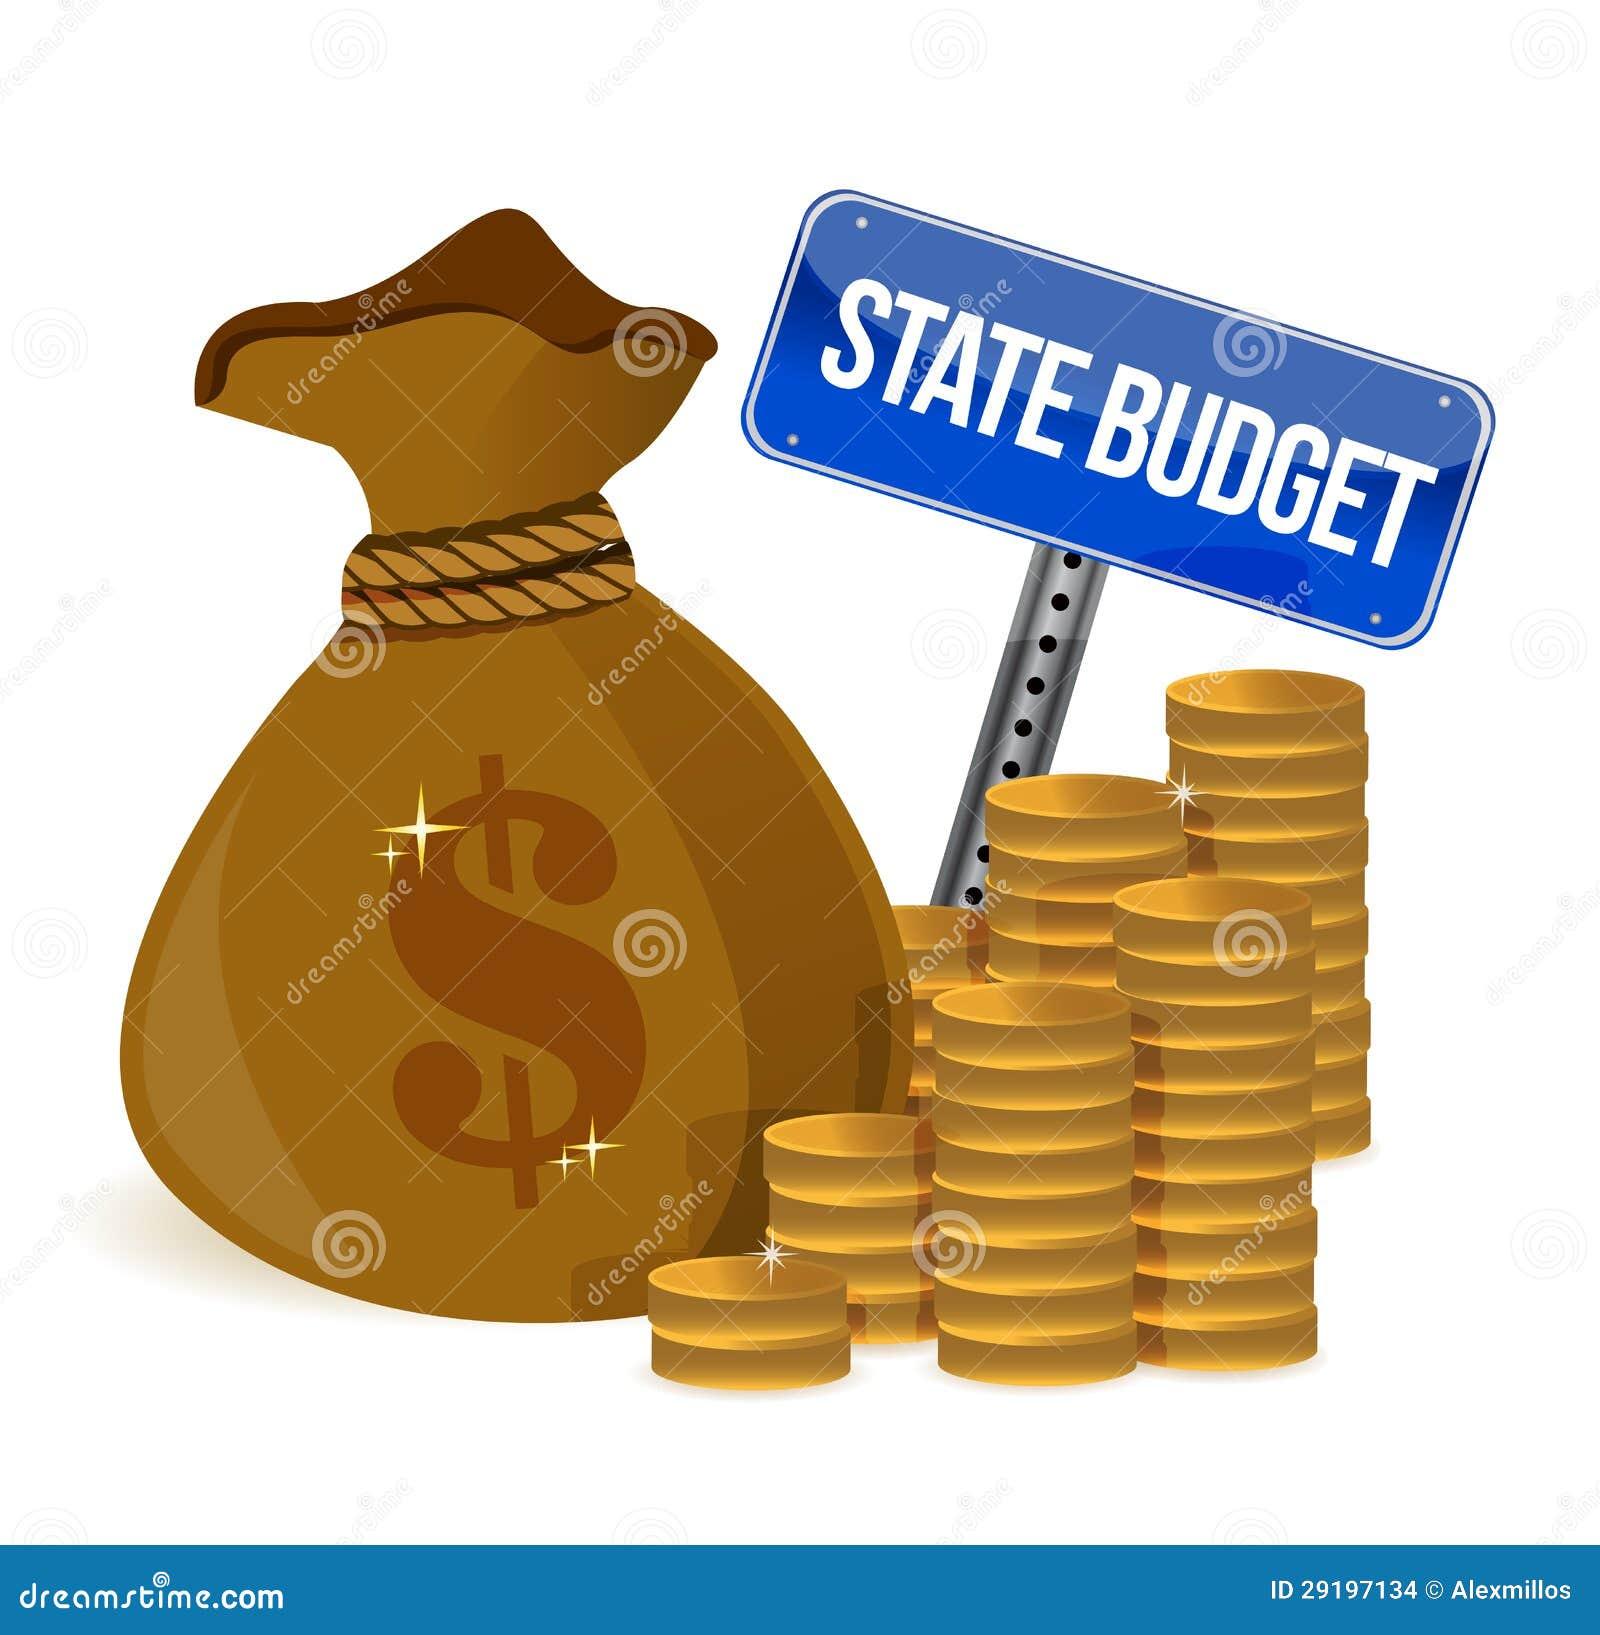 sac d 39 argent avec le budget de l 39 tat images stock image 29197134. Black Bedroom Furniture Sets. Home Design Ideas